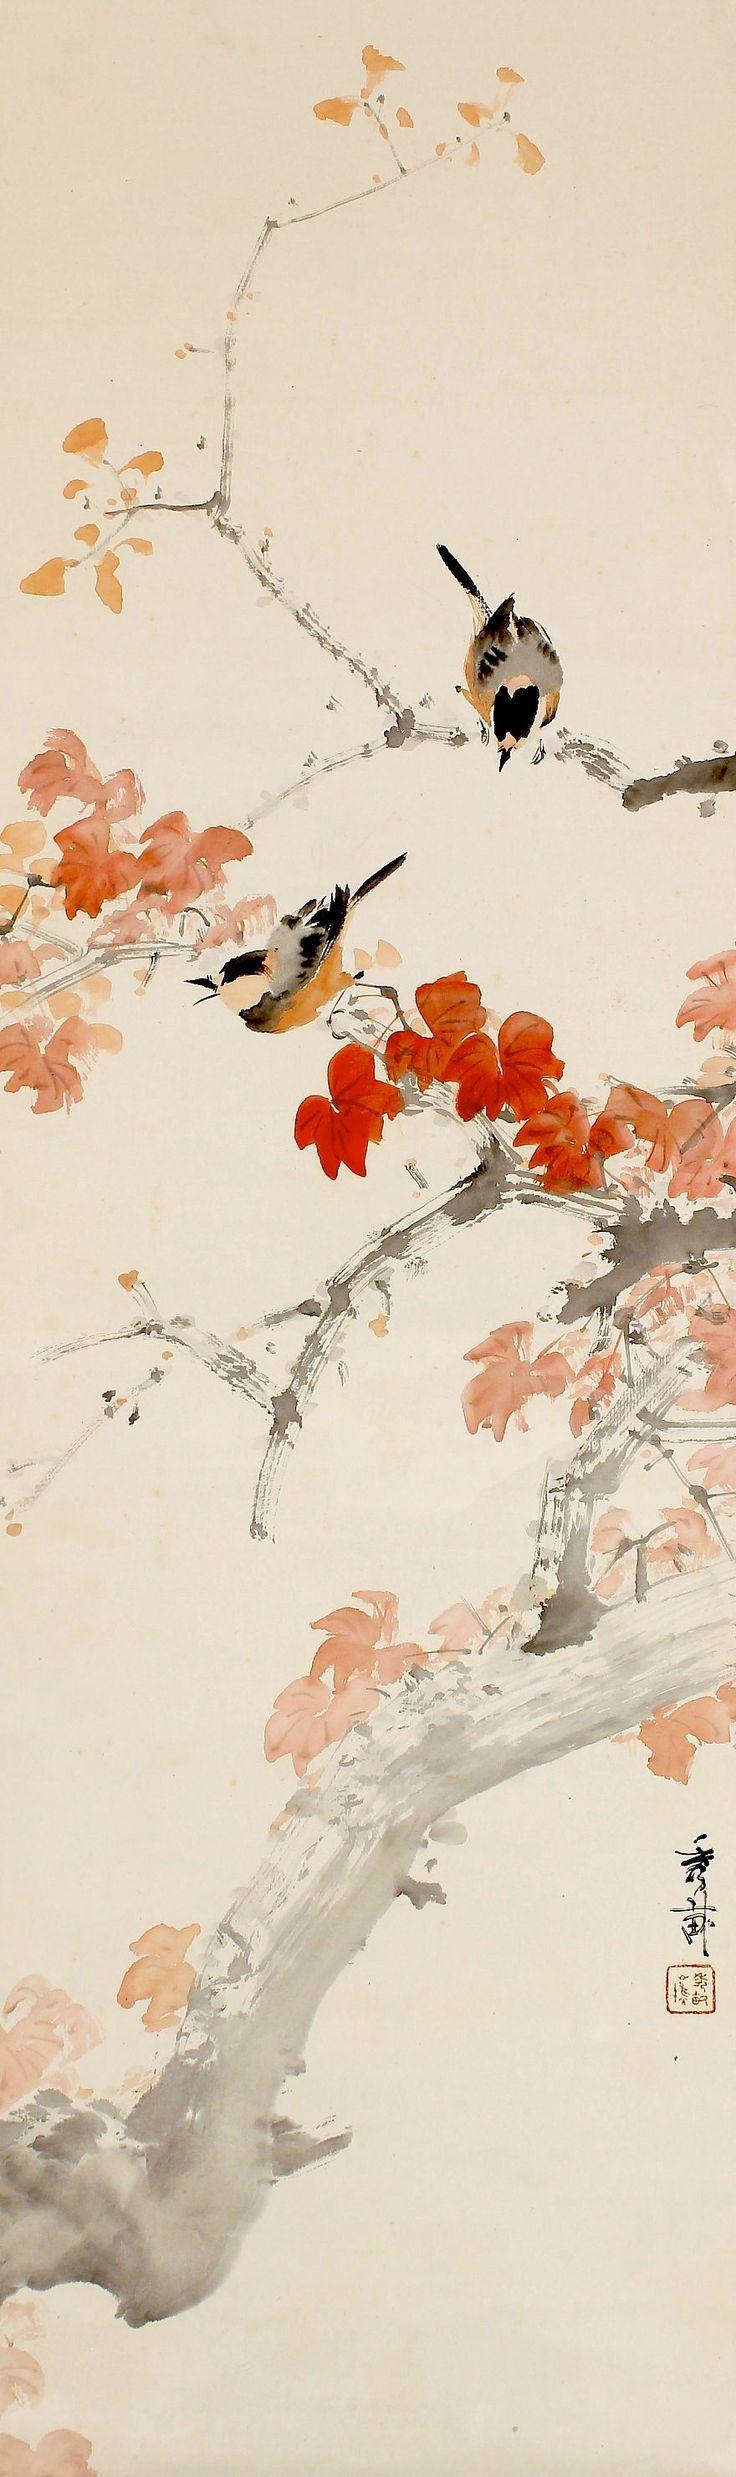 Ikegami Shuho 池上秀畝 (1874-1944), Autumn Sparrow